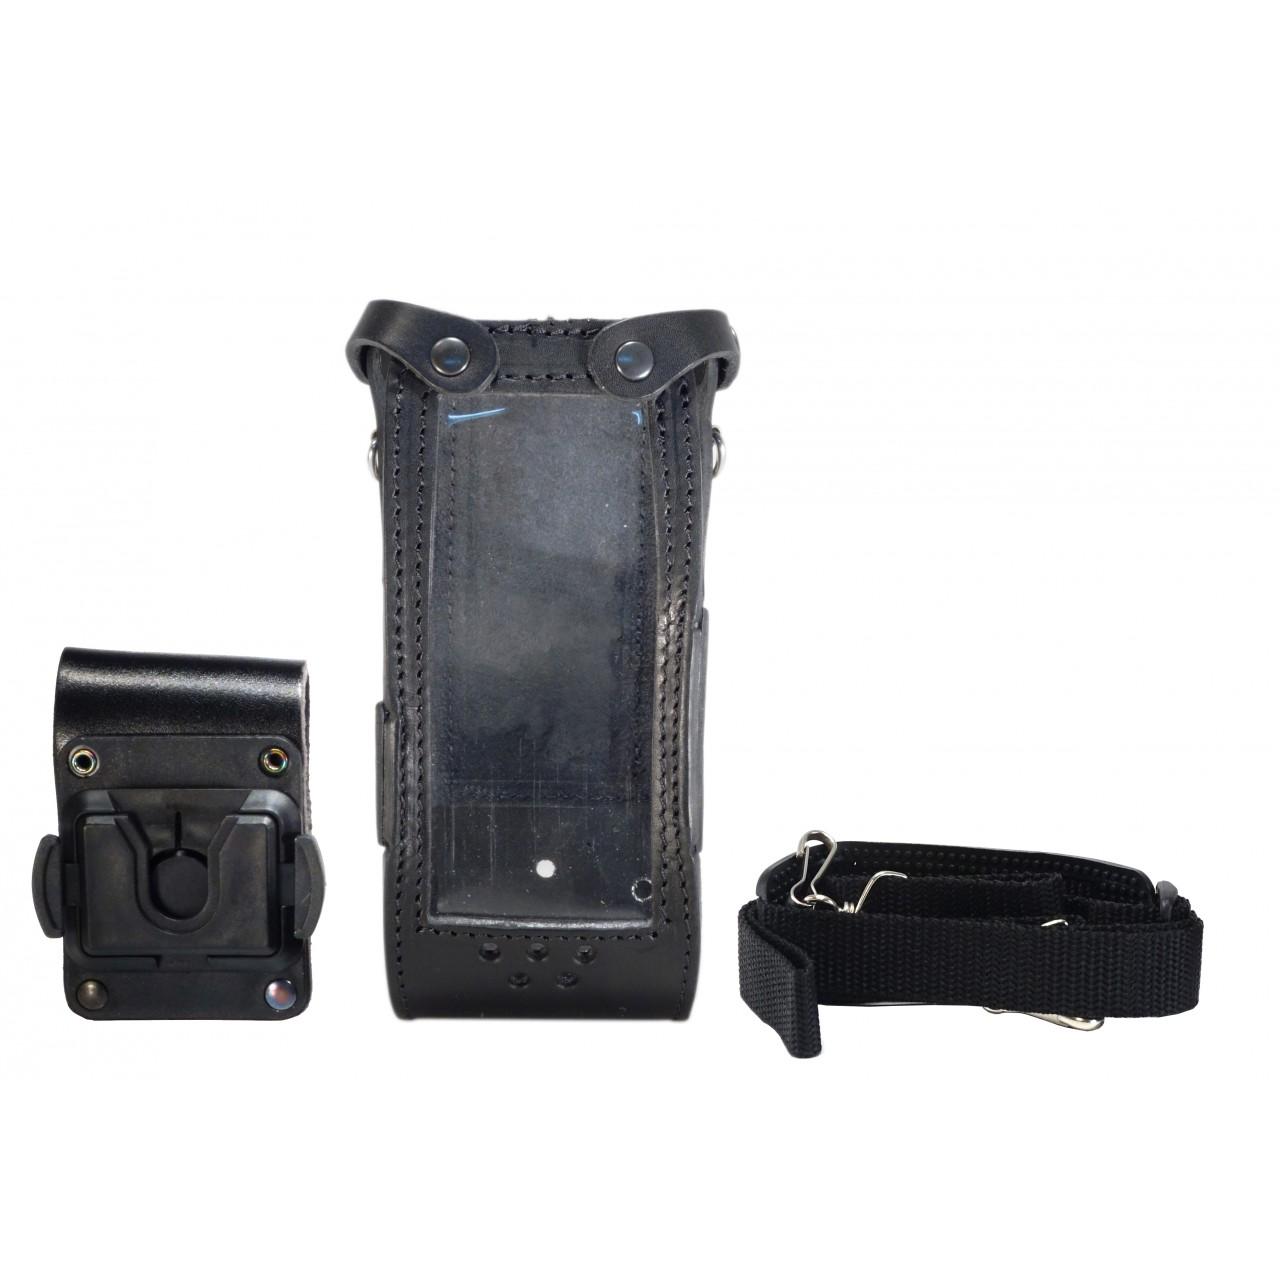 LC-ERA25PIVO Covers, fasteners and cradles - ICOM